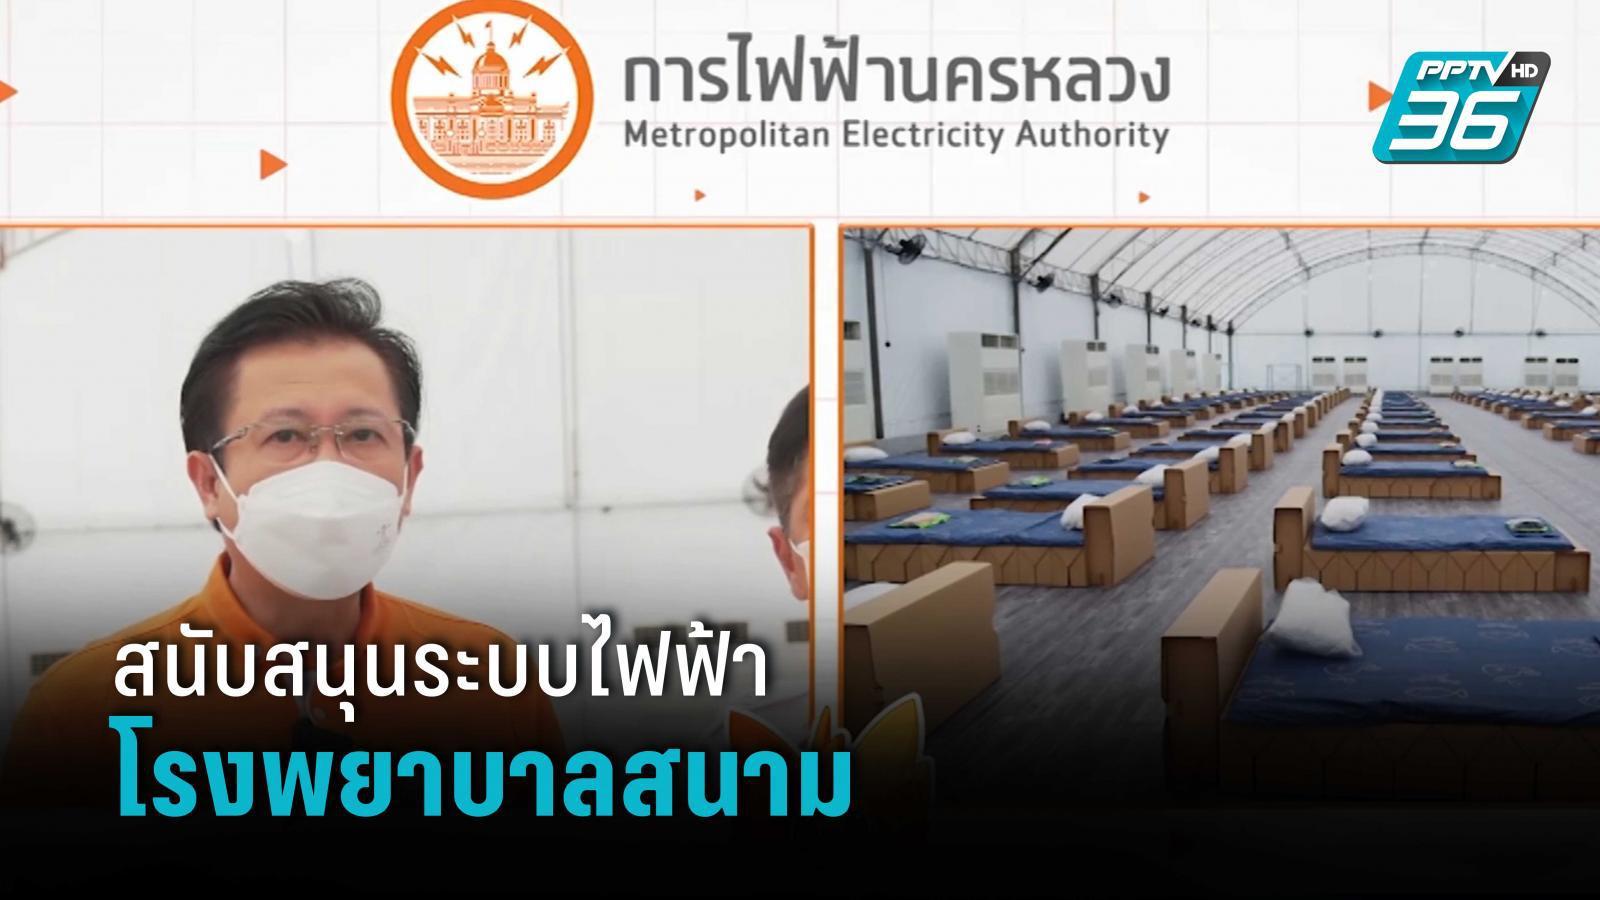 MEA สนับสนุนระบบไฟฟ้าโรงพยาบาลสนาม กทท.